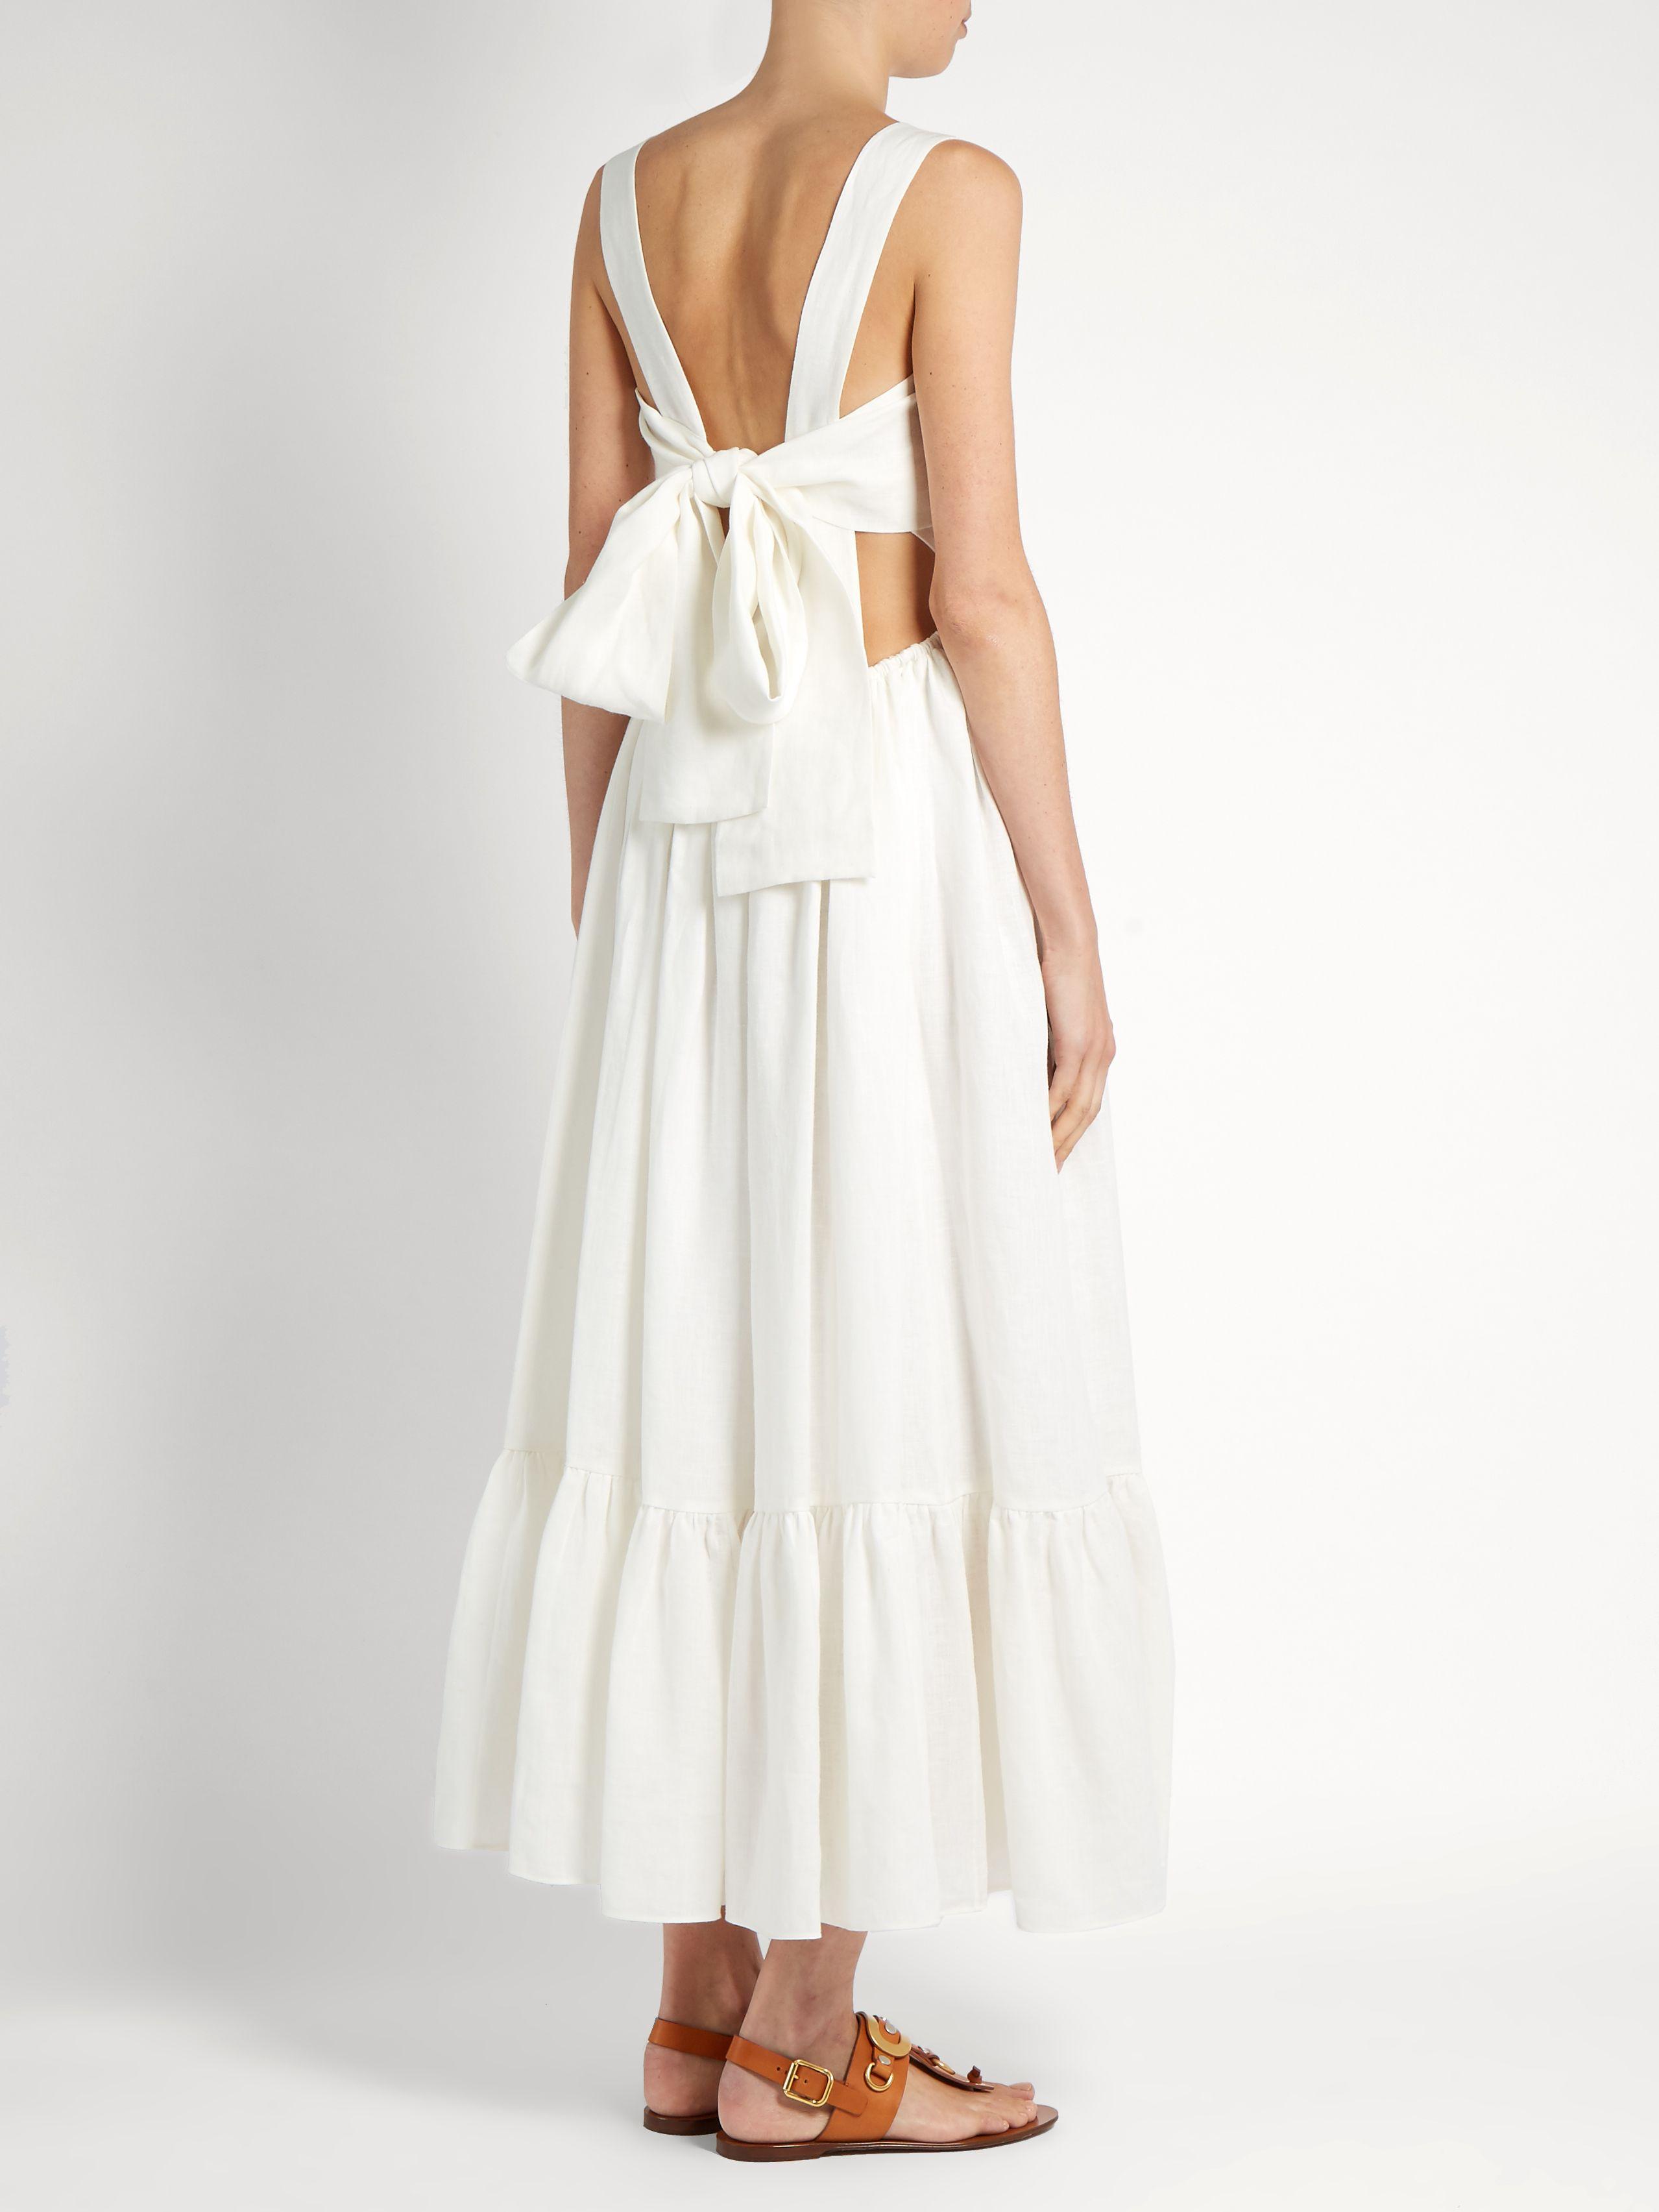 Tie Back Linen Dress Chloe Matchesfashion Com Dresses Linen Dress Dress To Impress [ 3409 x 2557 Pixel ]